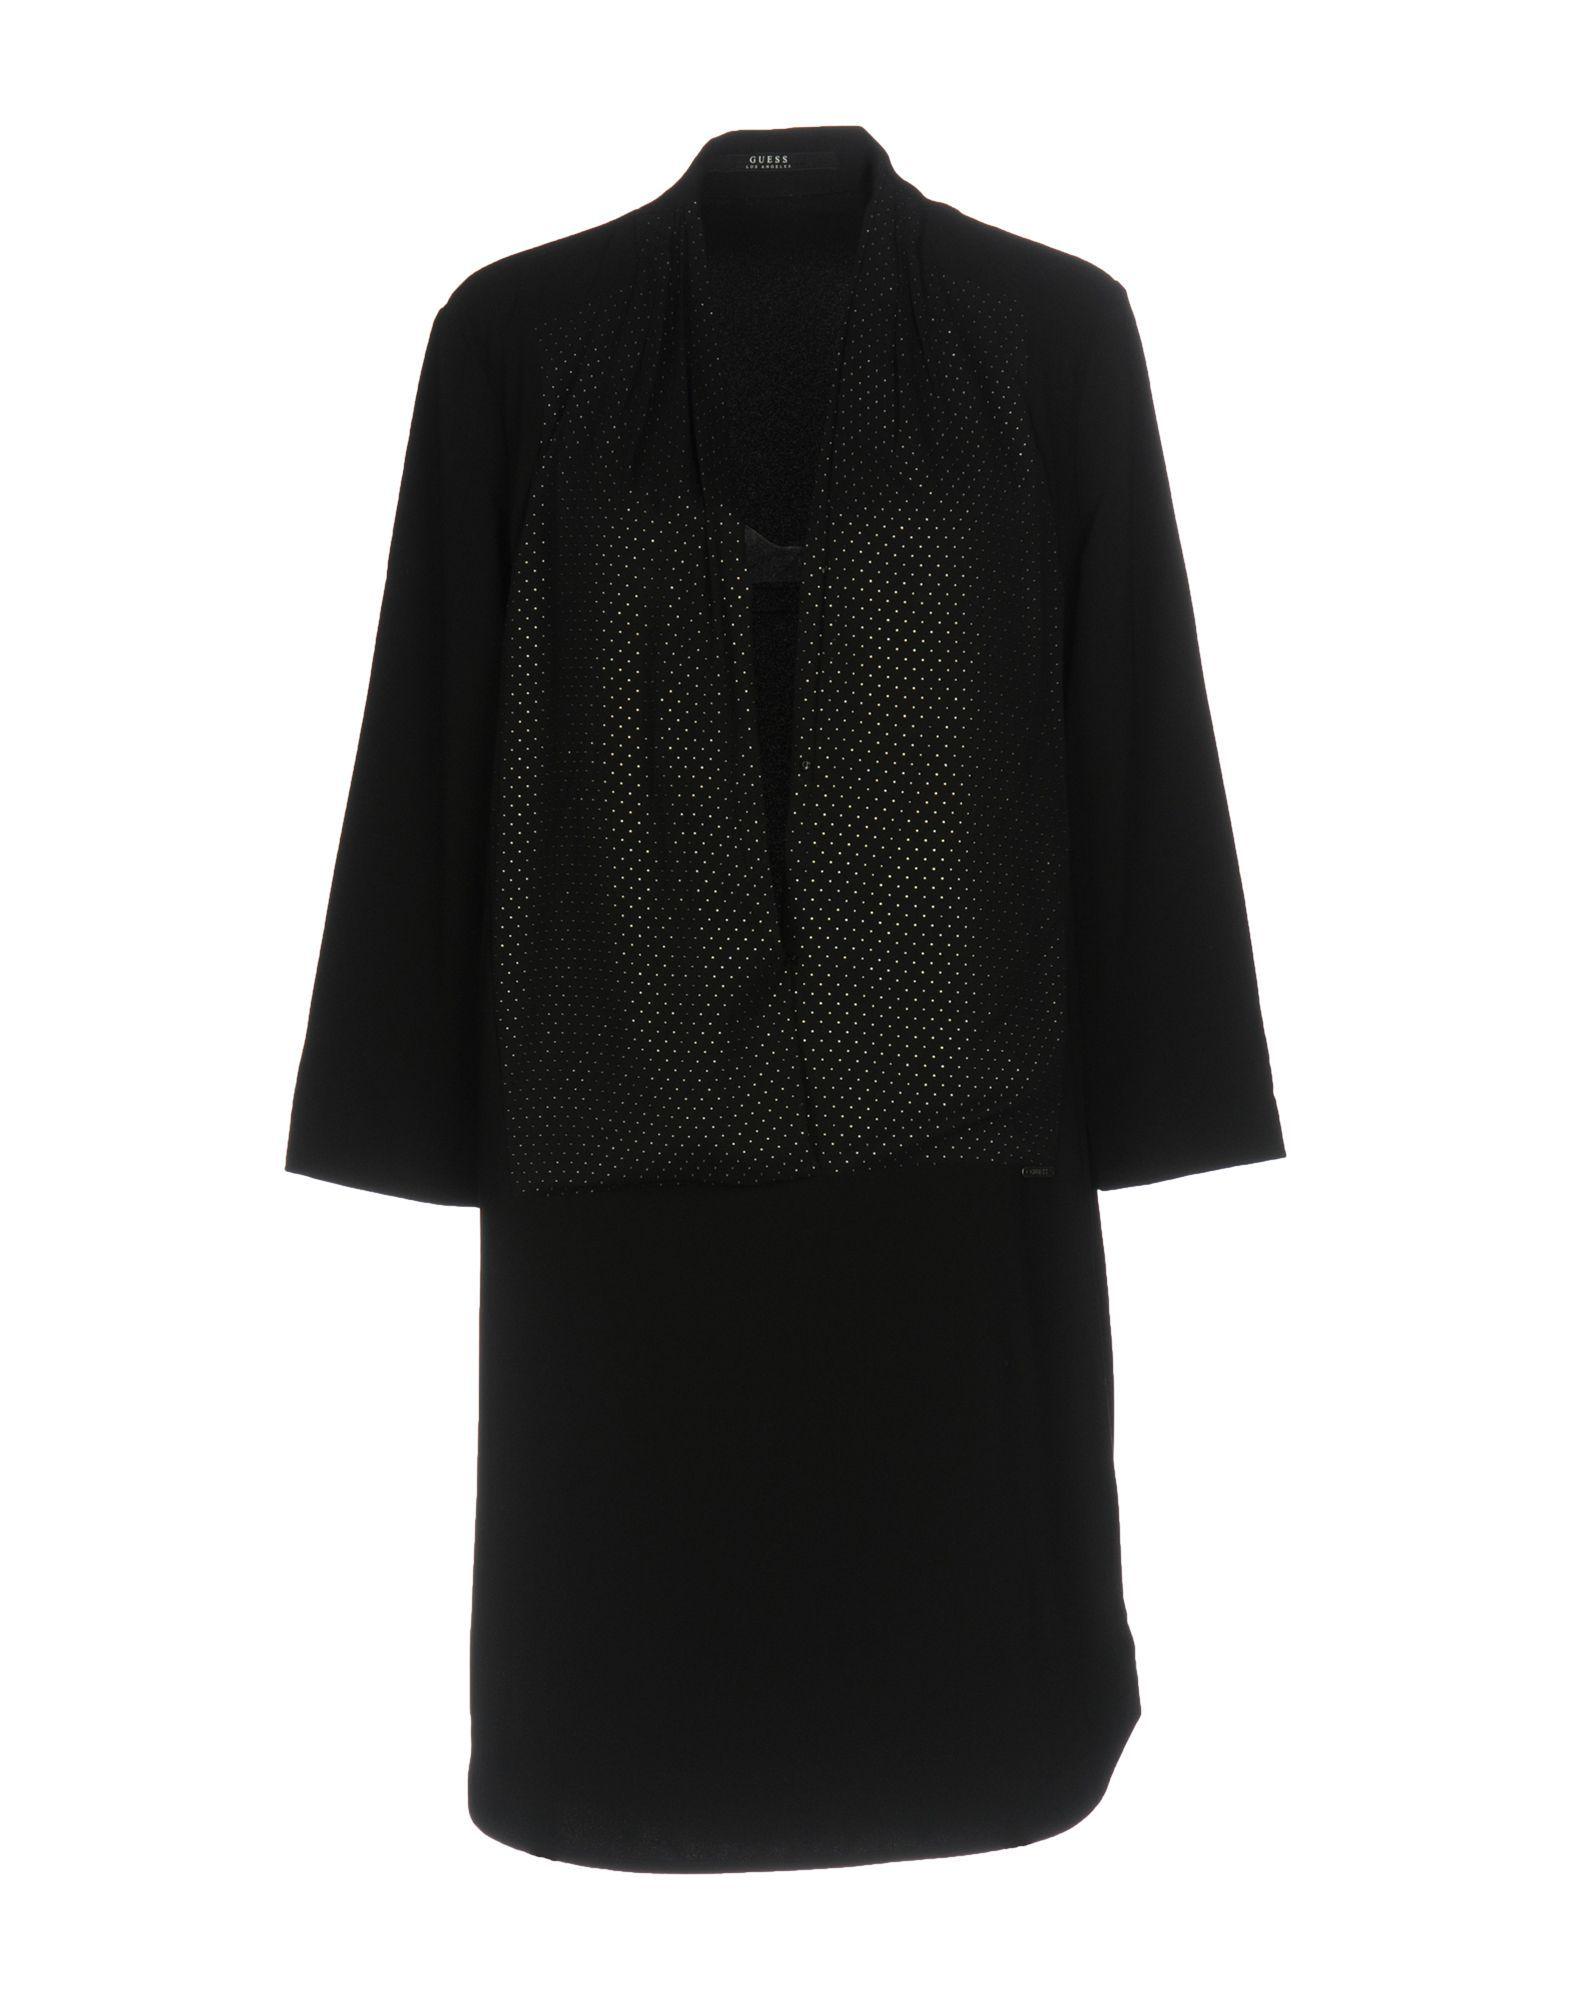 Guess Black Crepe Long Sleeve Dress